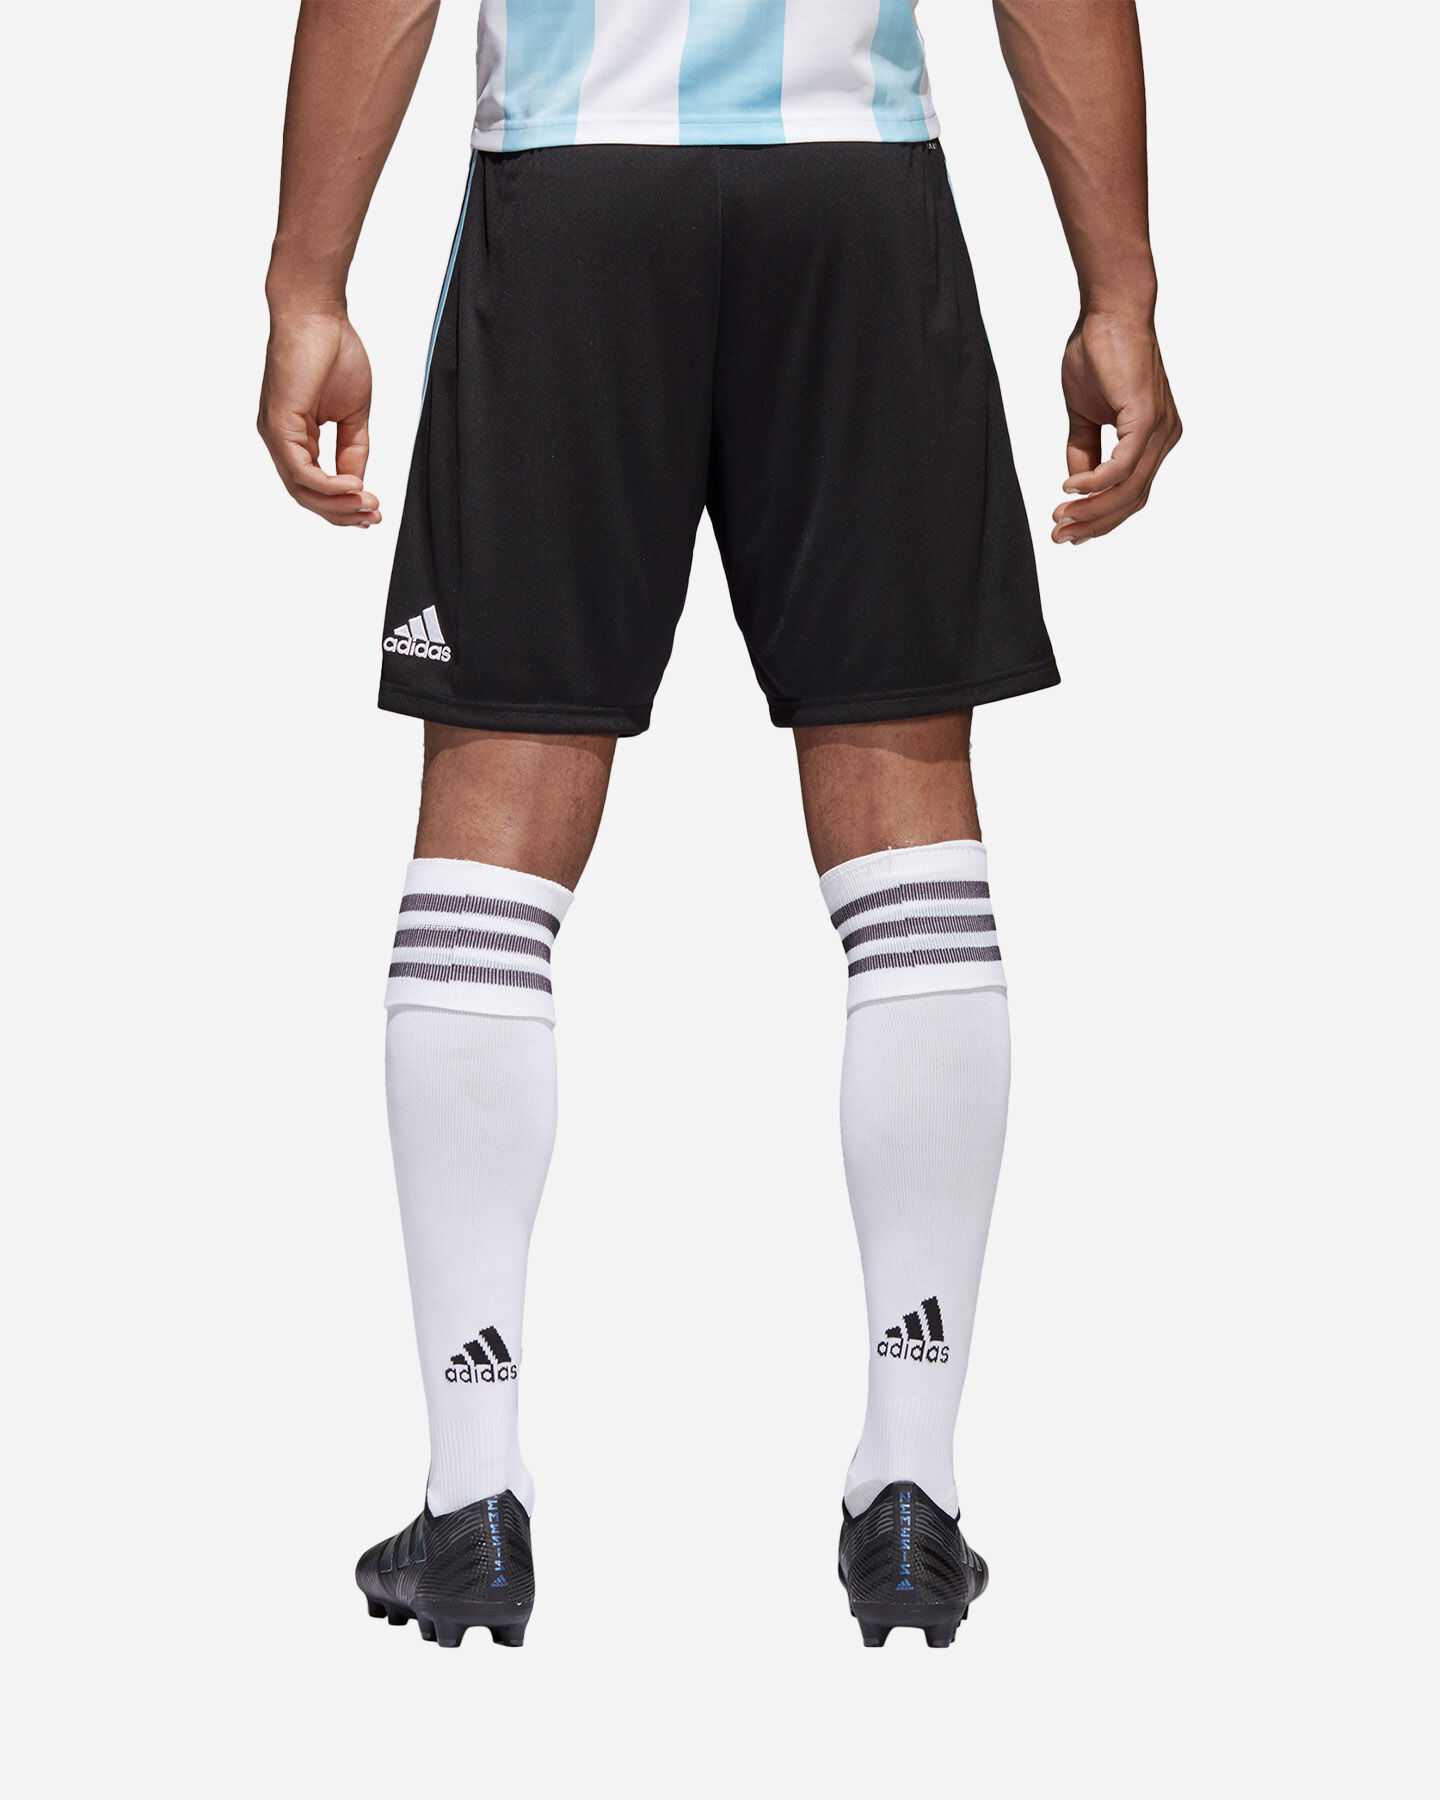 spray In ogni modo progenie  Pantaloncini Calcio Adidas Argentina World Cup 2018 M BQ9283 | Cisalfa Sport